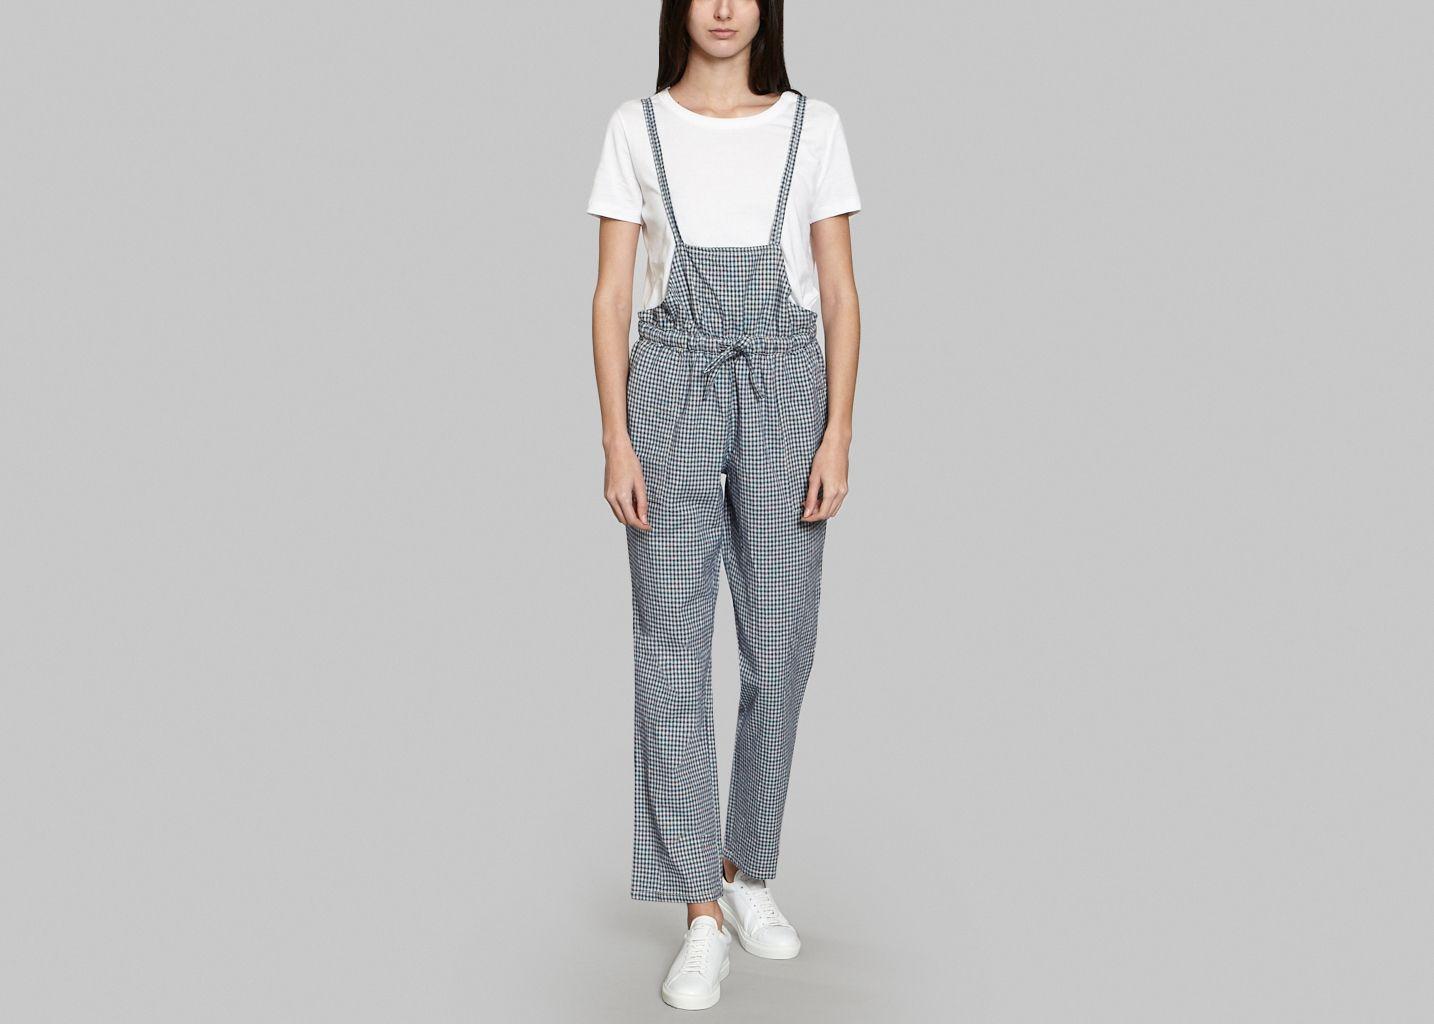 Combi pantalon origami leon harper bleu marine l 39 exception - Combi pantalon bleu marine ...